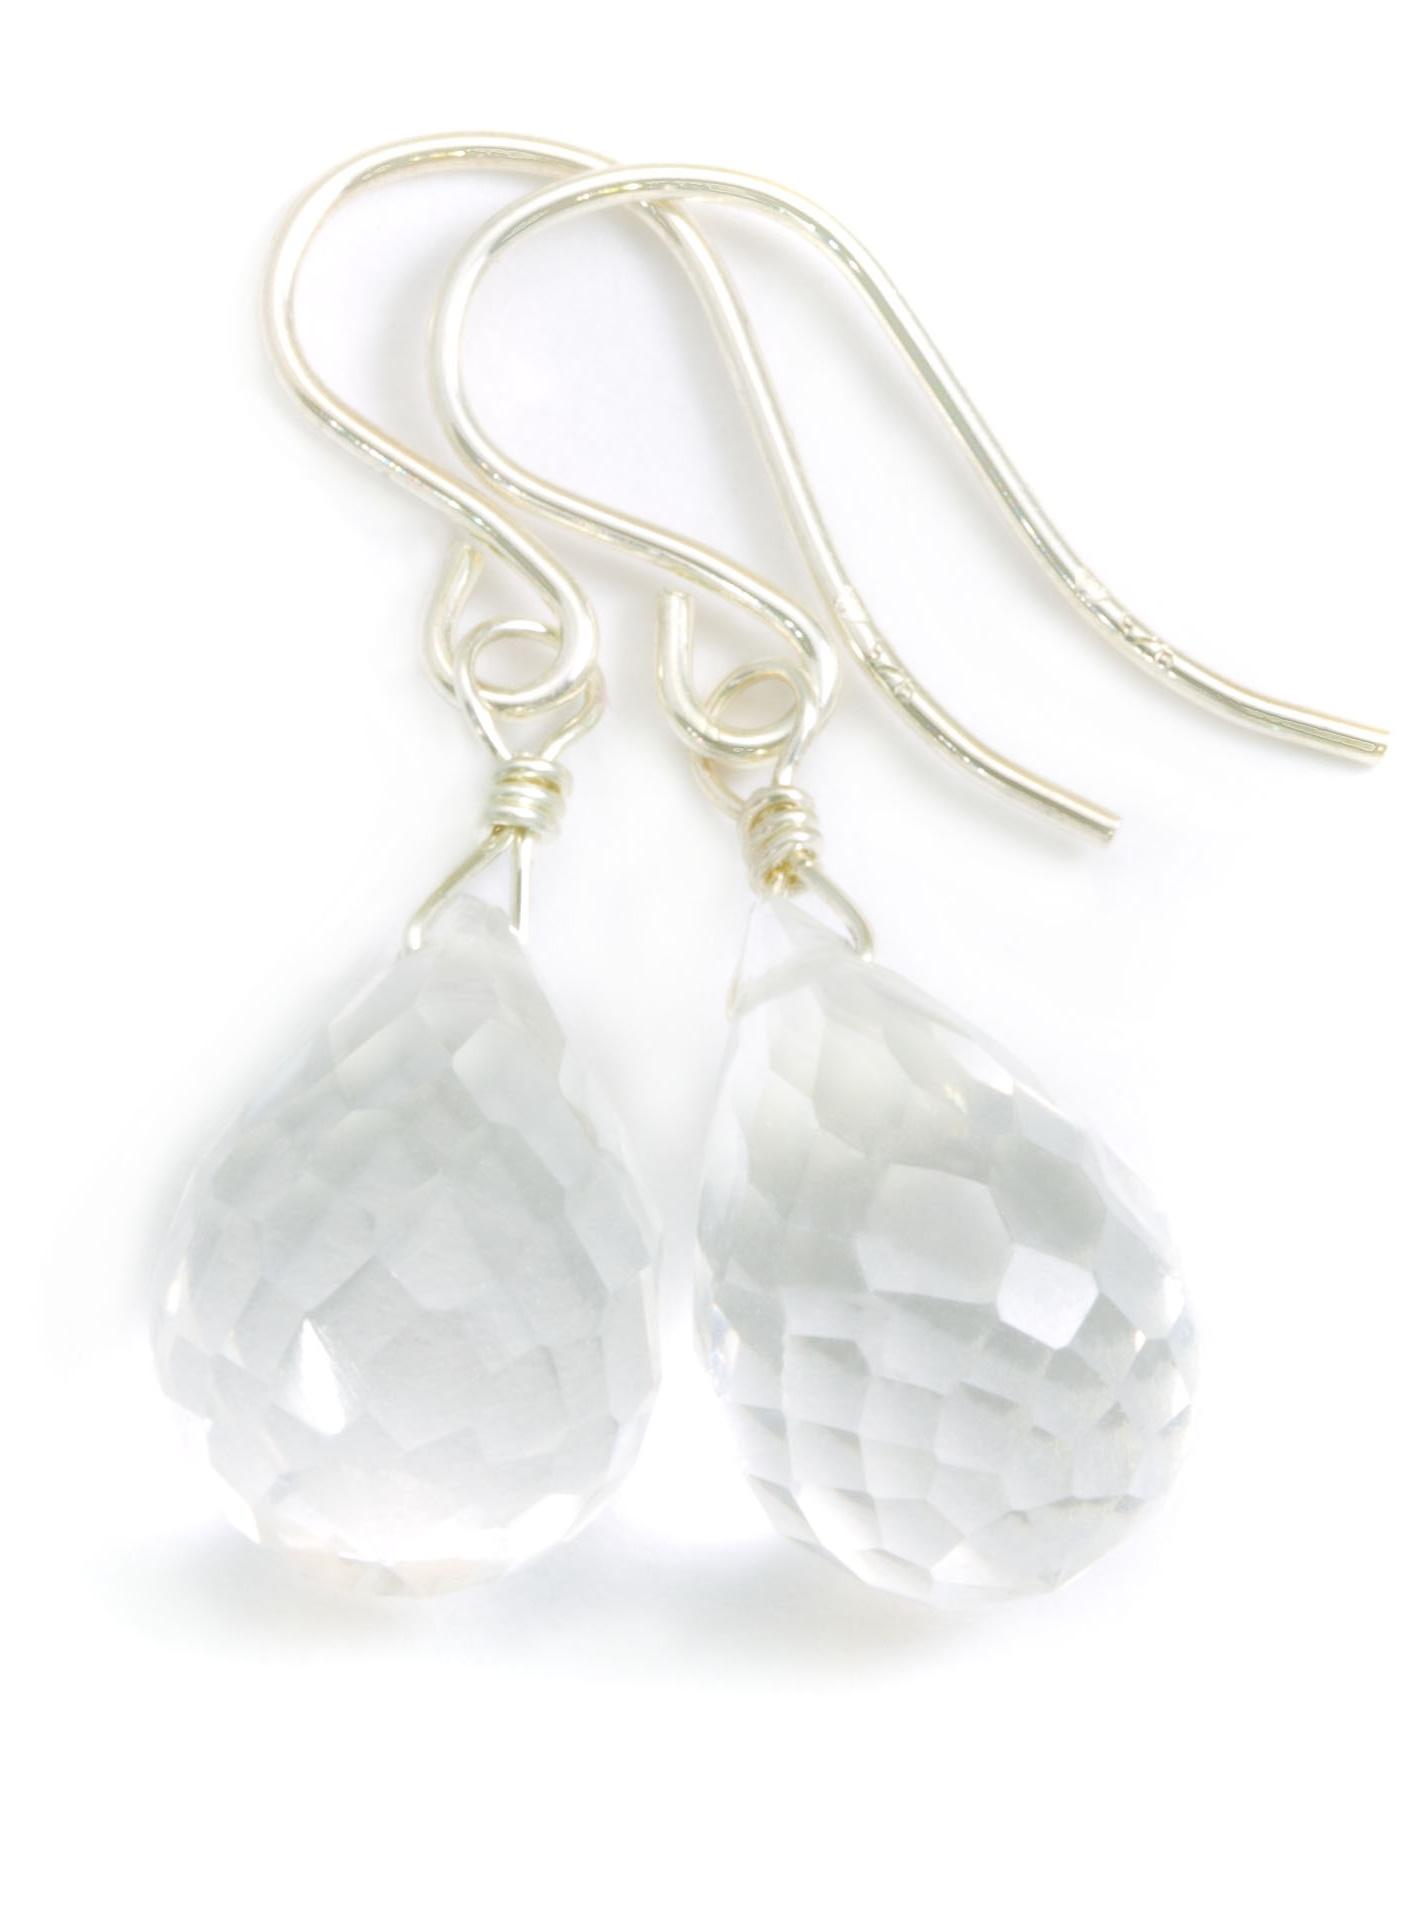 Clear Quartz Earrings Faceted Rounded Briolette Shape Teardrop Drops Sterling Silver Spyglass Designs